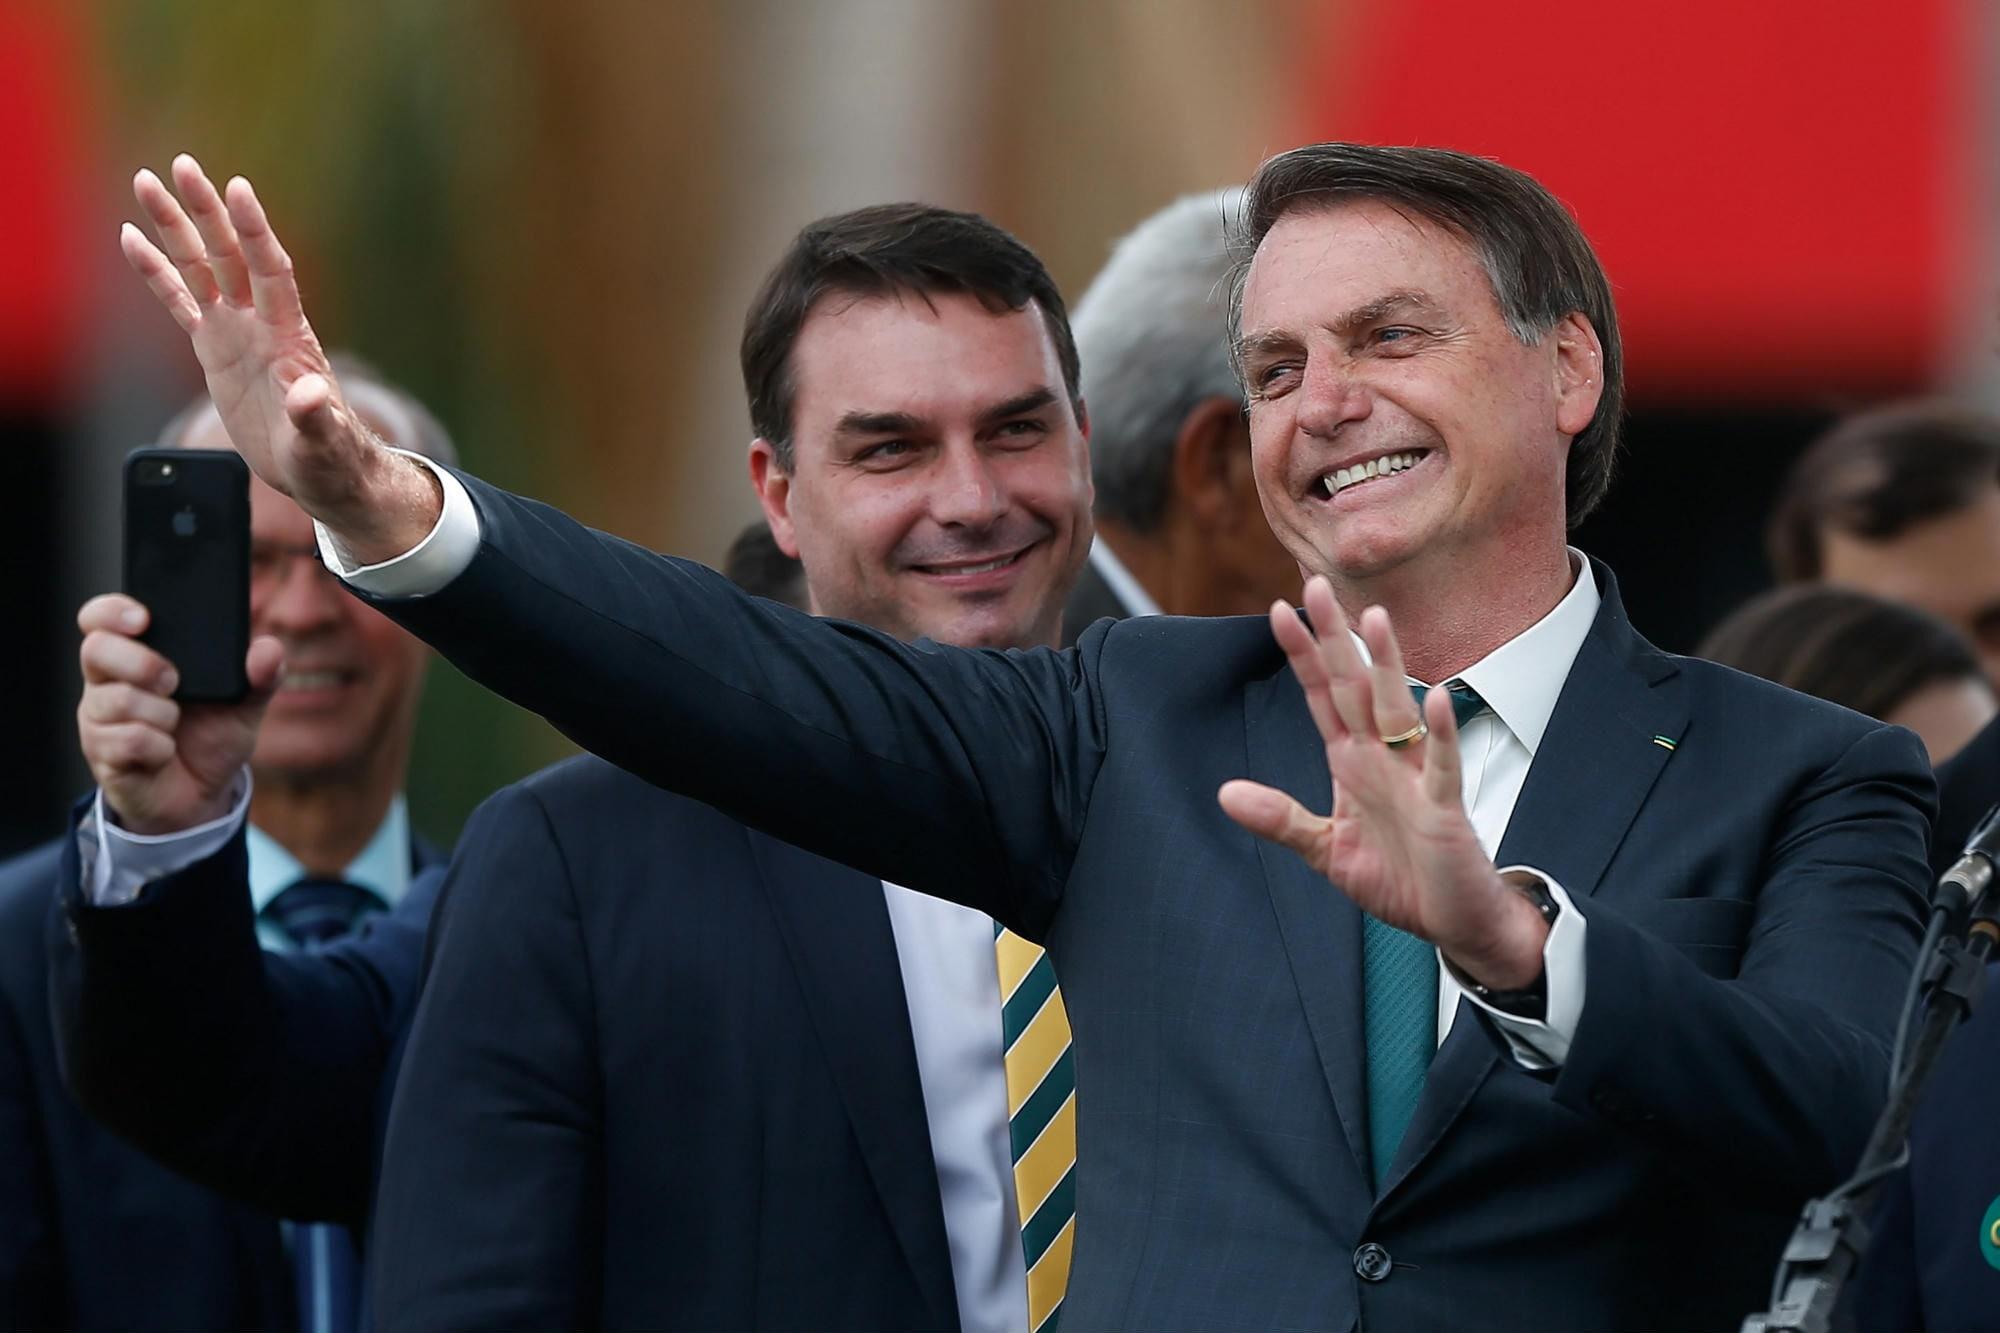 jair bolsonaro brazil elnök amazonas tűzvész leonardo dicaprio